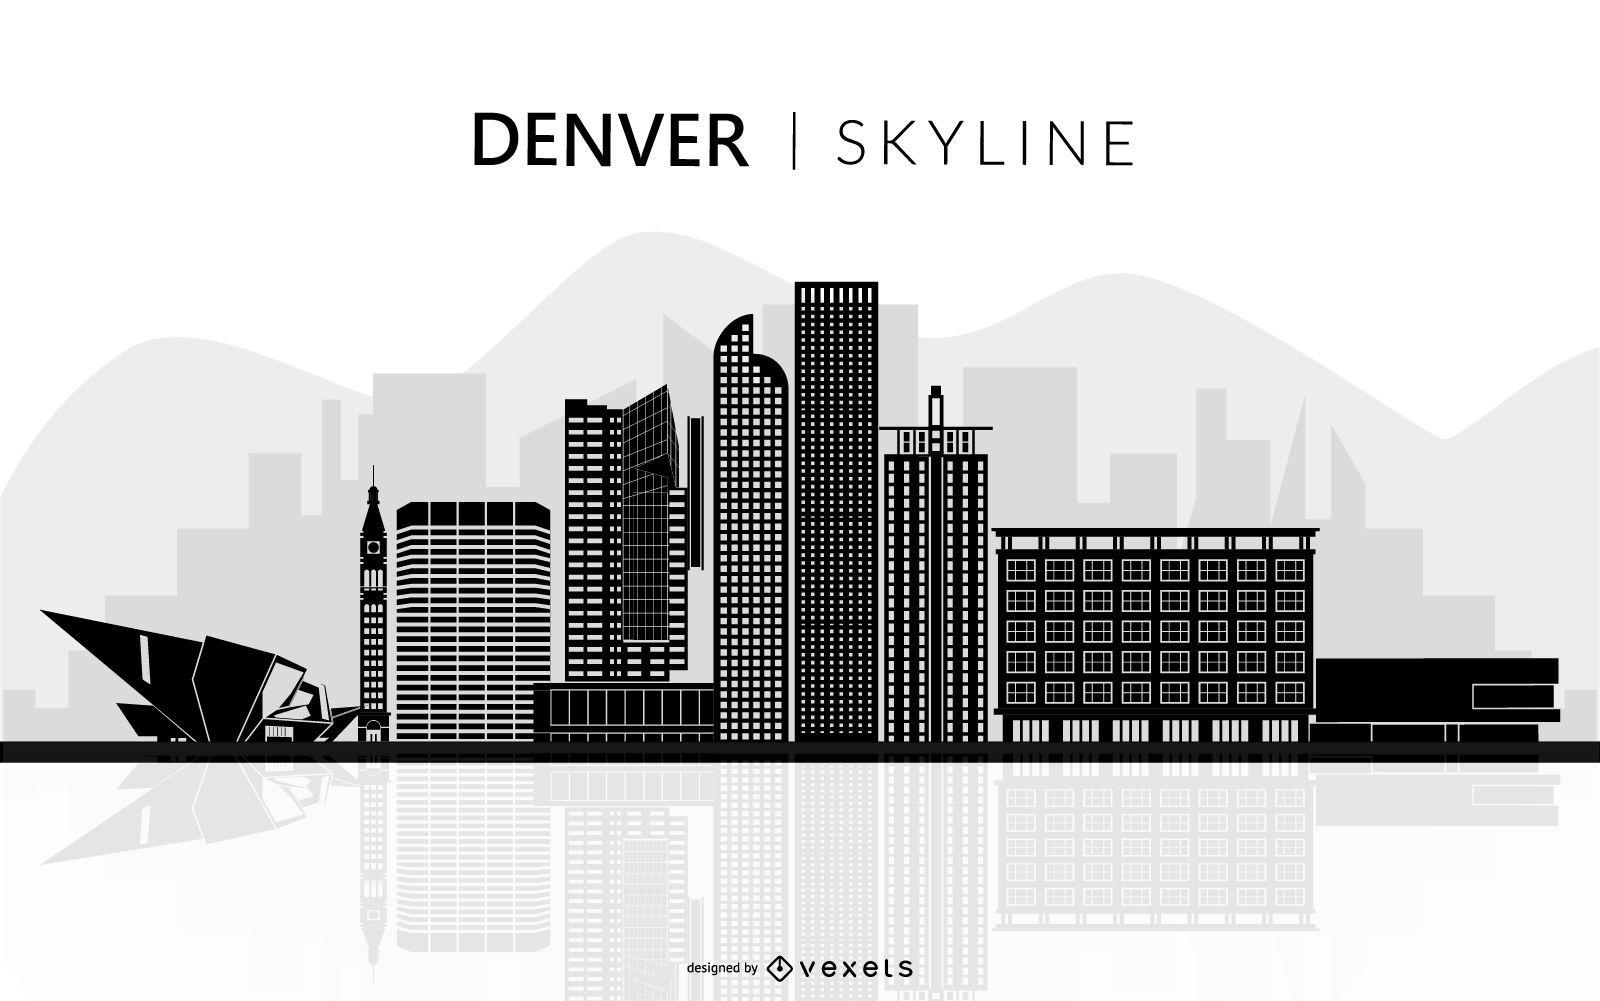 Denver skyline silhouette